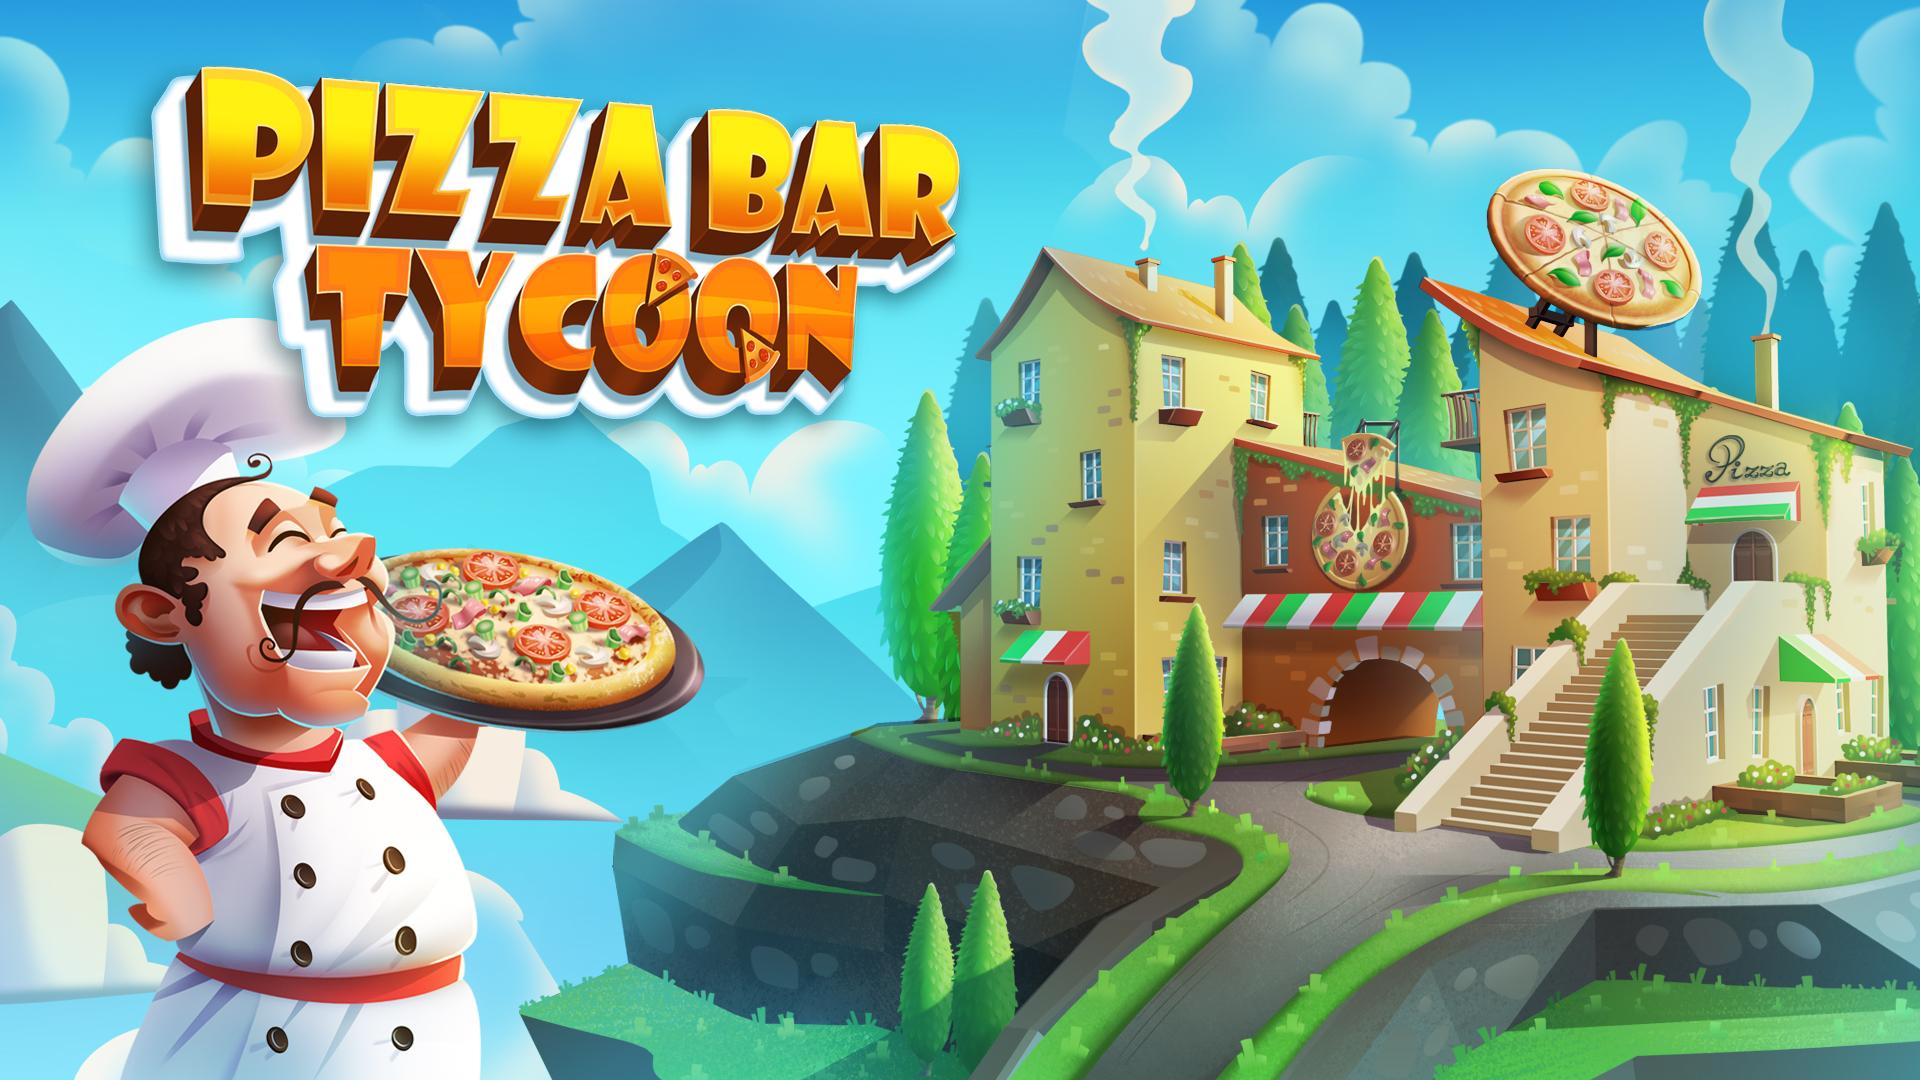 [Nintendo Switch Digital] Flowlines VS $0.05, Pizza Bar Tycoon FREE